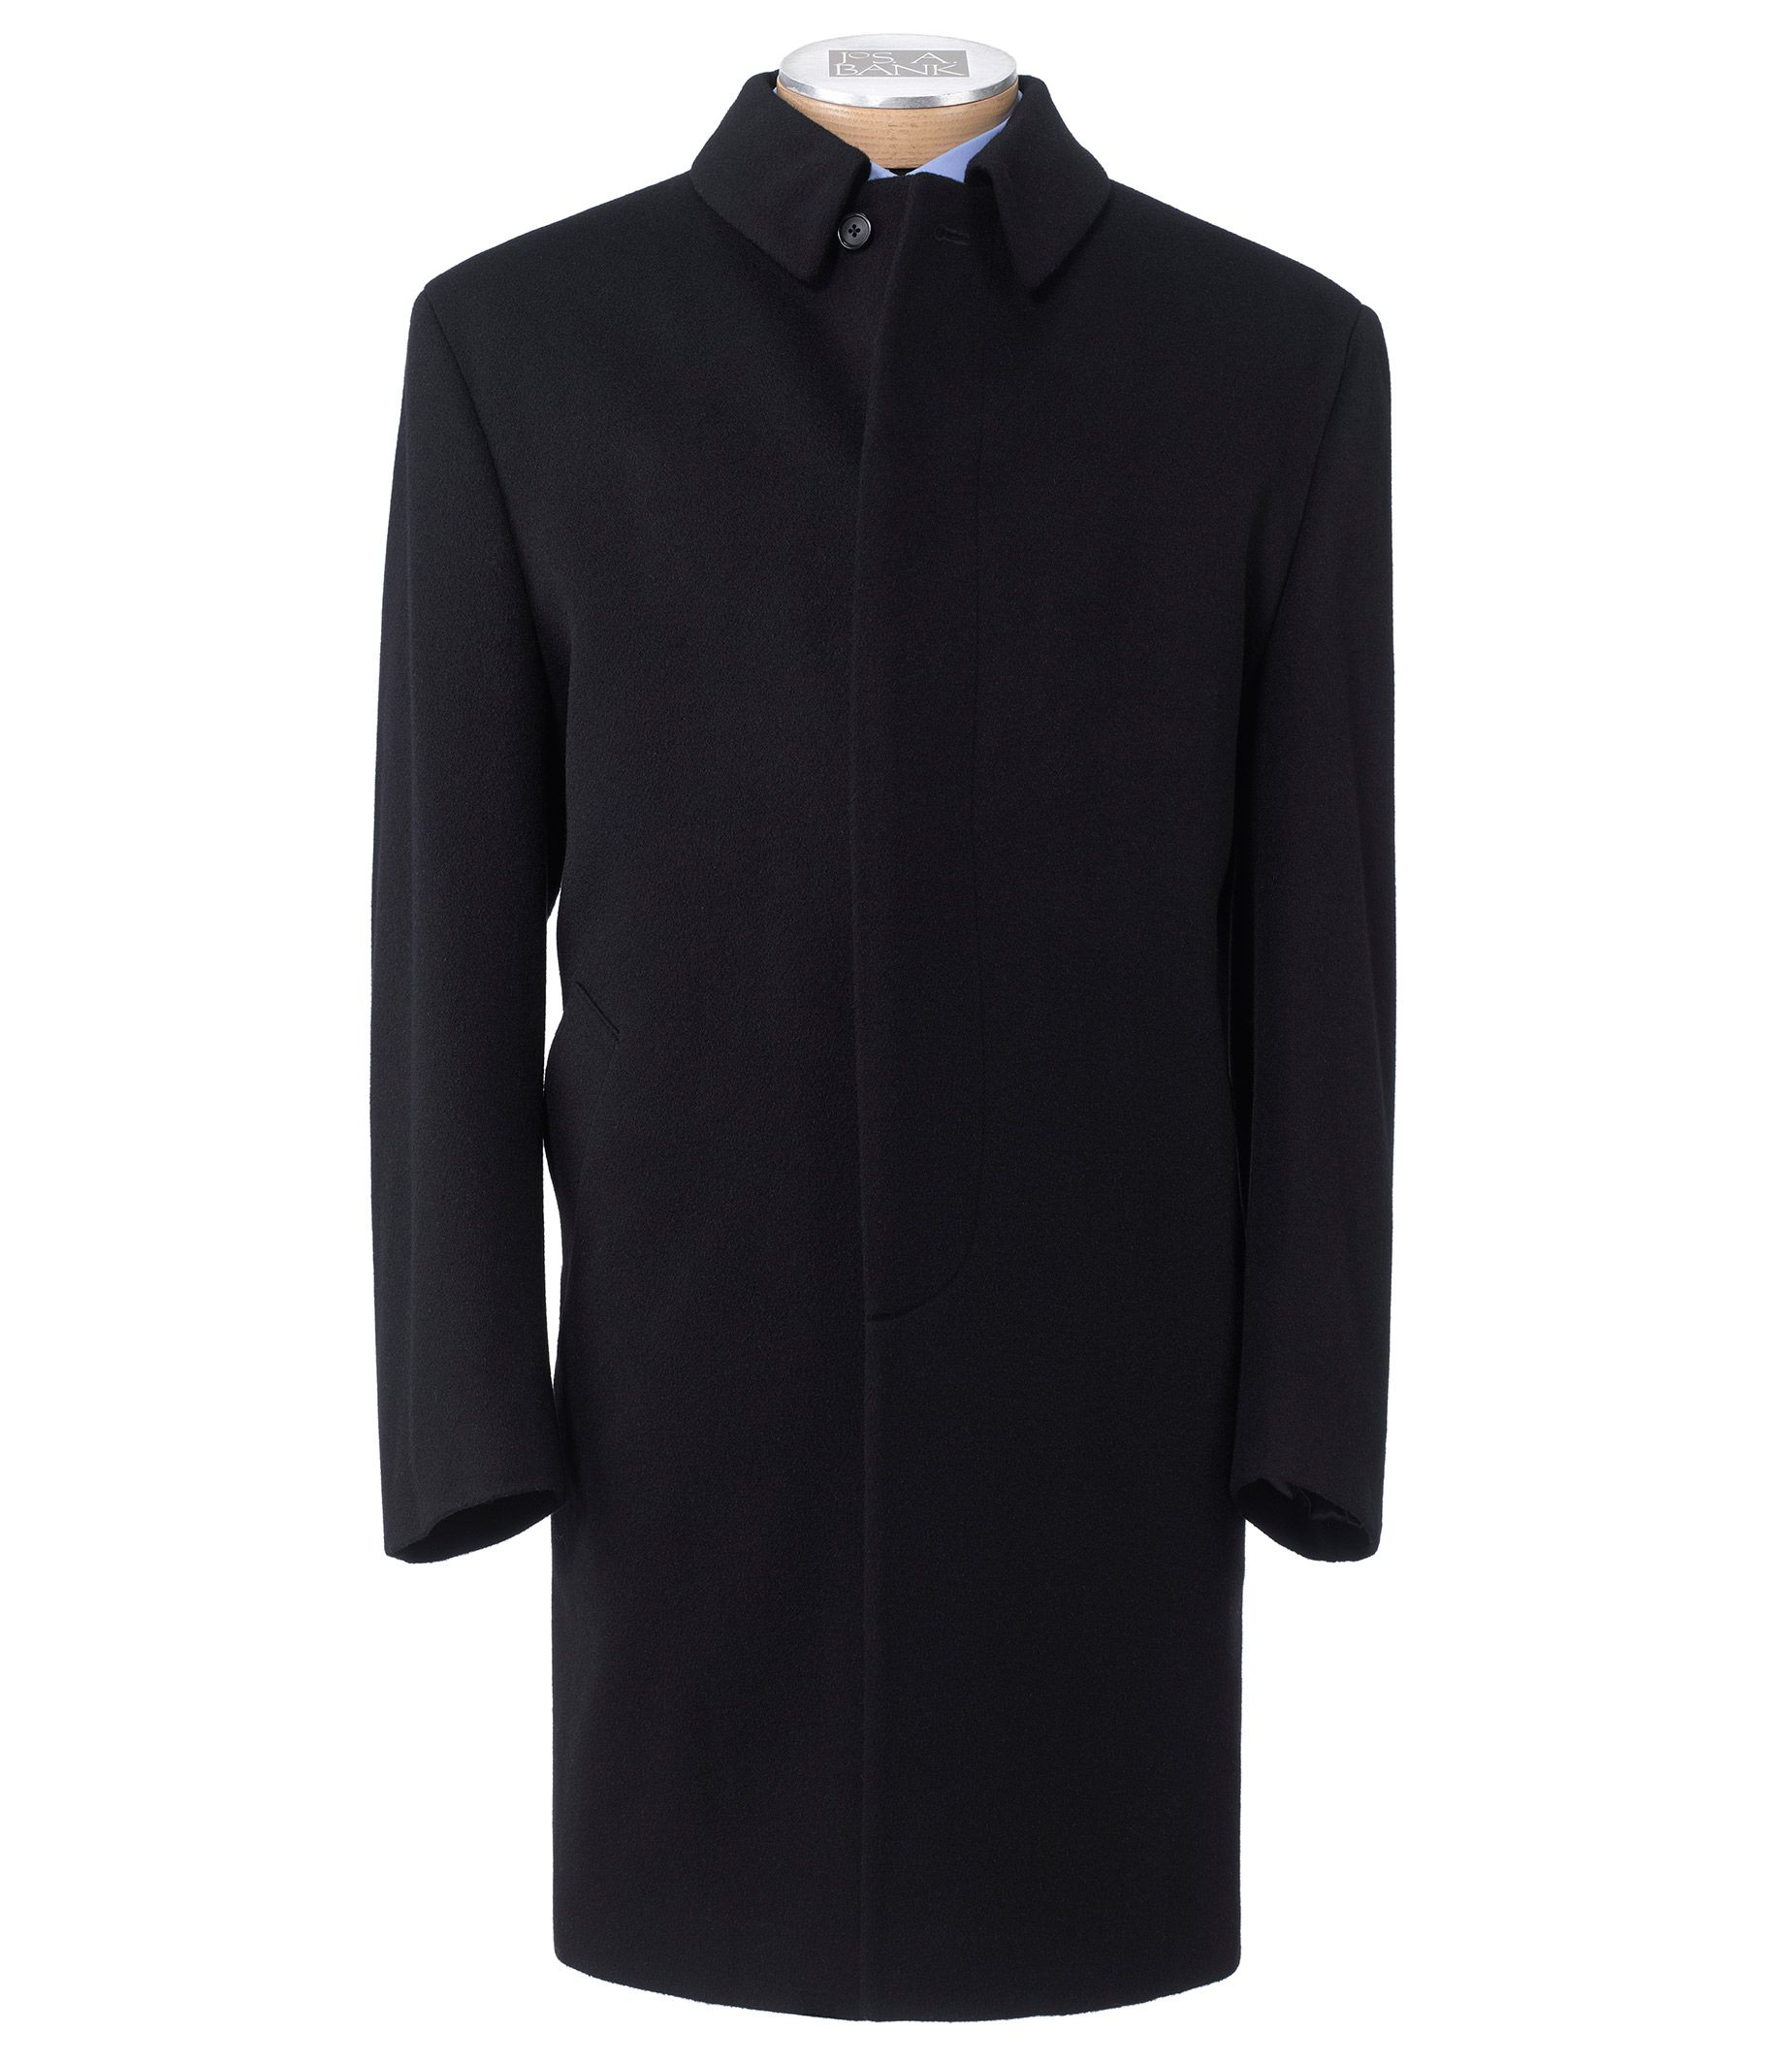 Imperial Blend Three-Quarter Length Bal Collar Topcoat